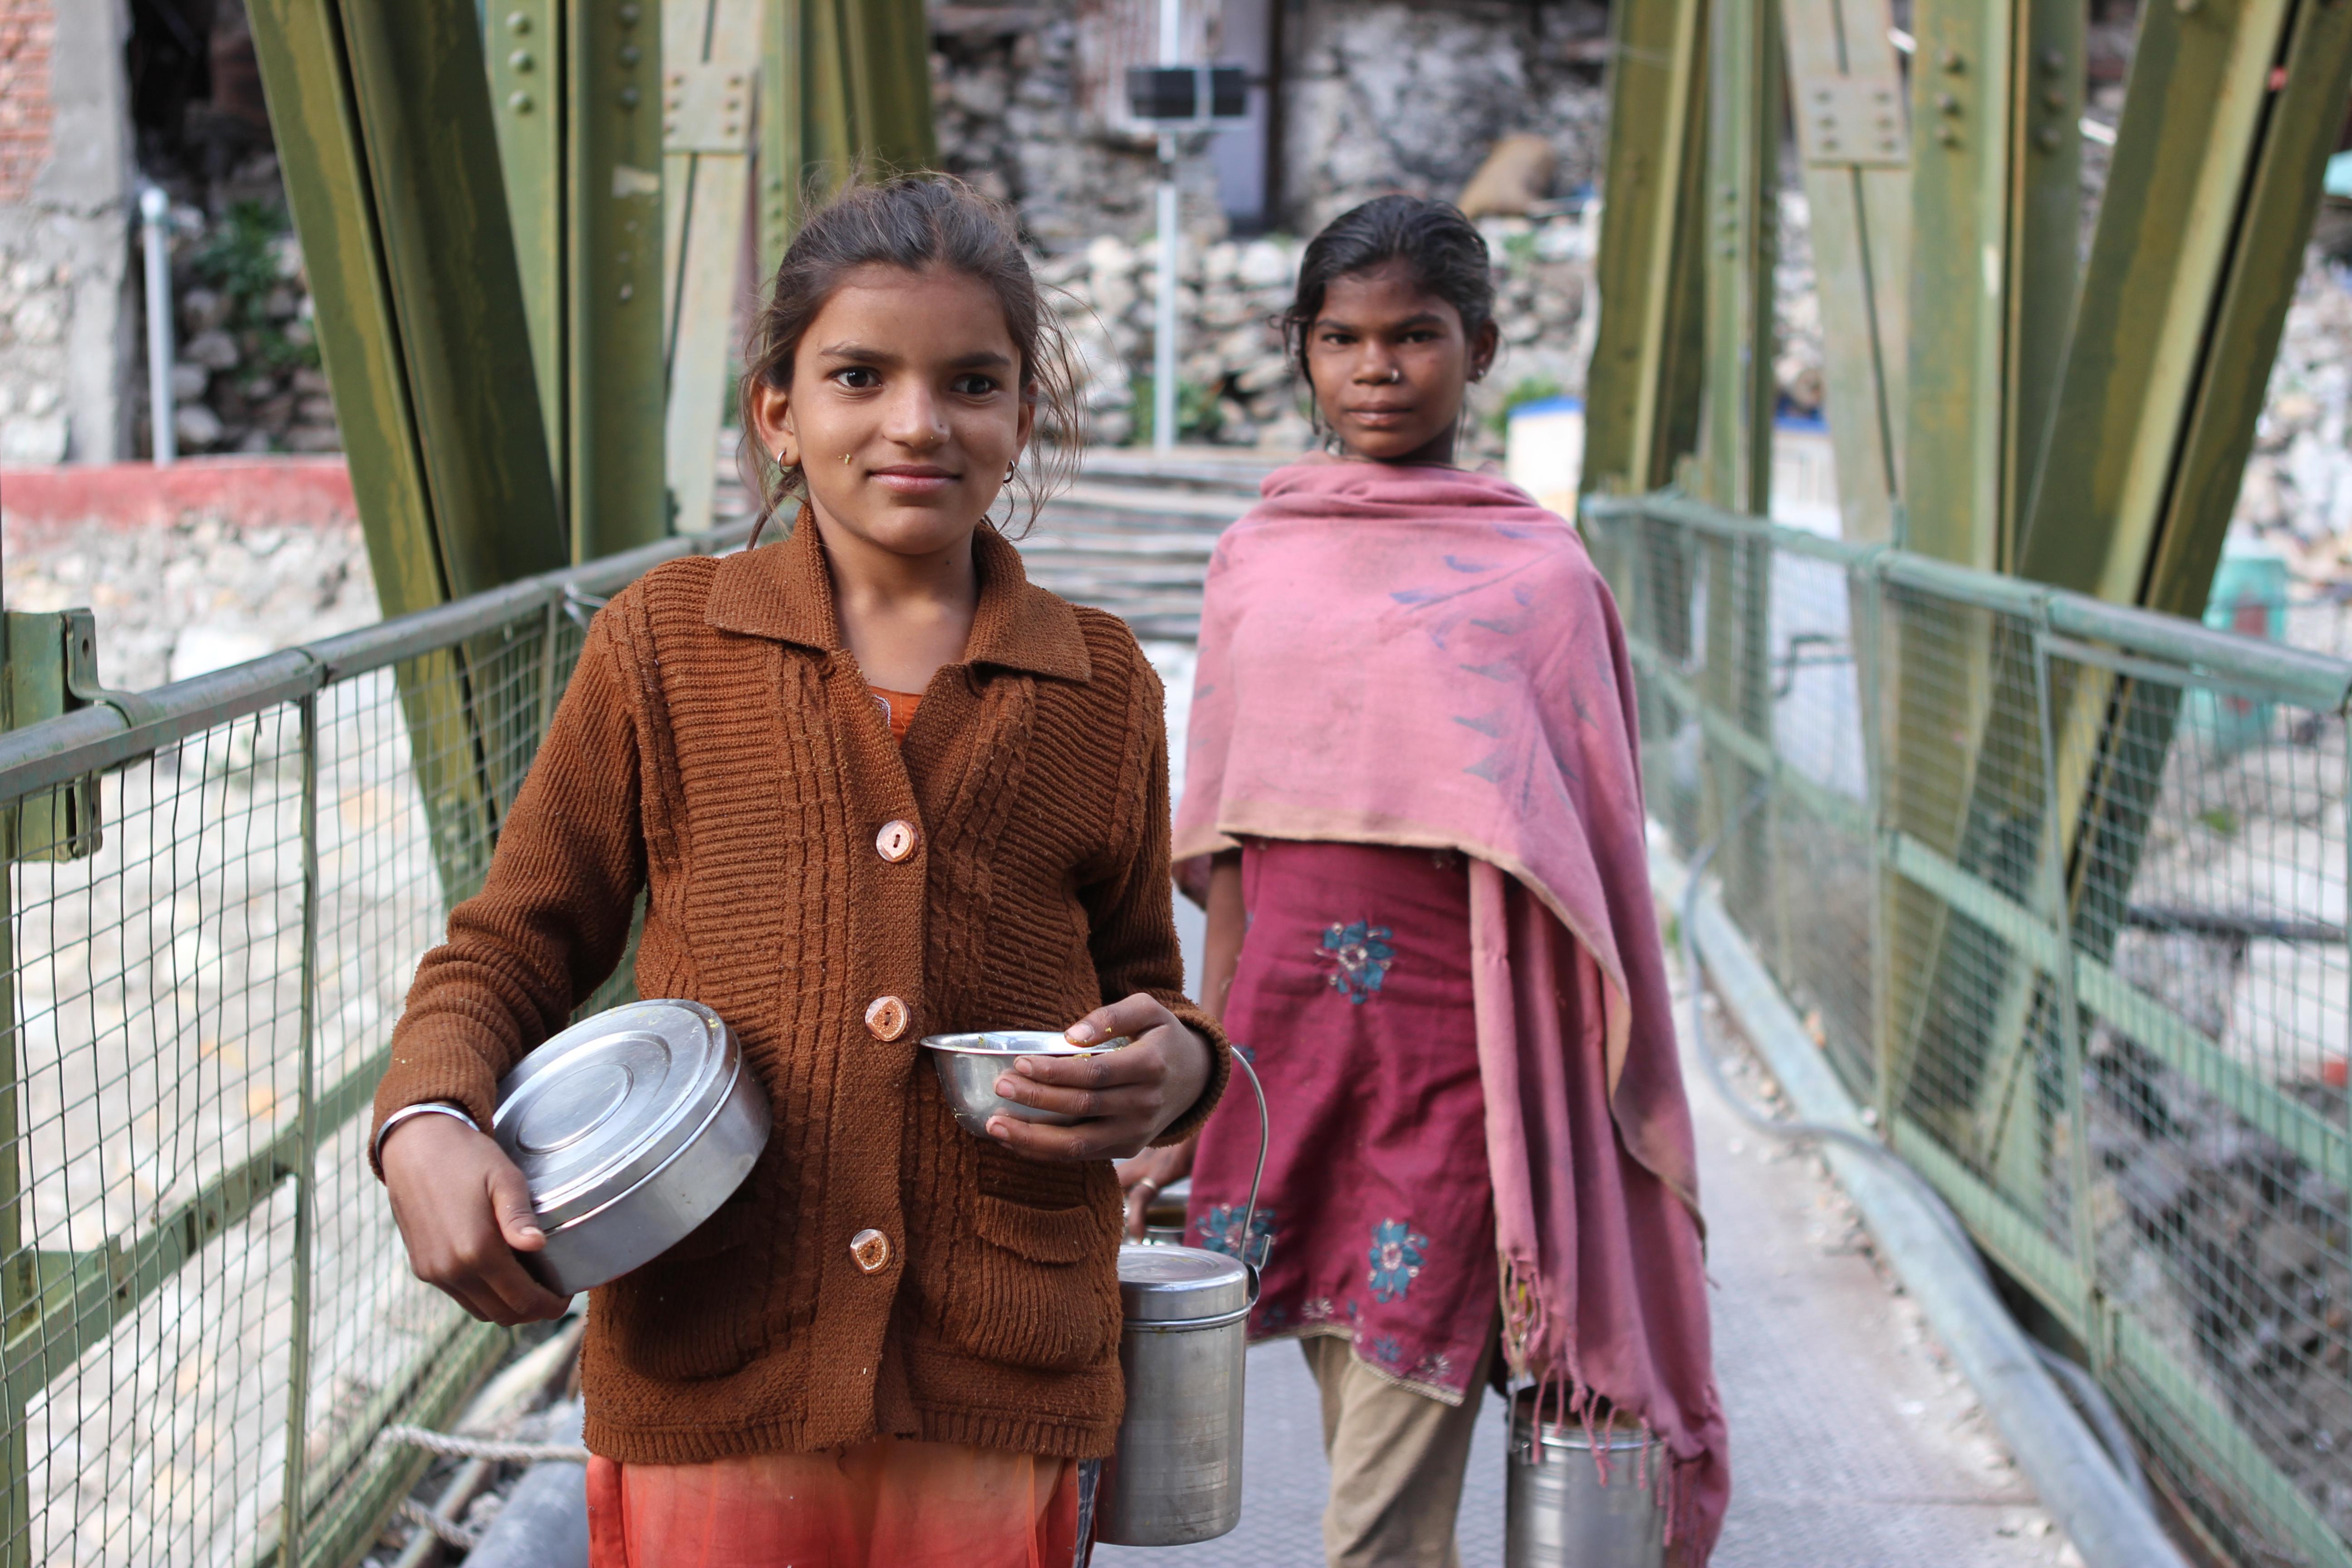 The two girls and their tiffin boxes on Gangotri's main (but totally tiny) bridge. Photo: Trixie Pacis